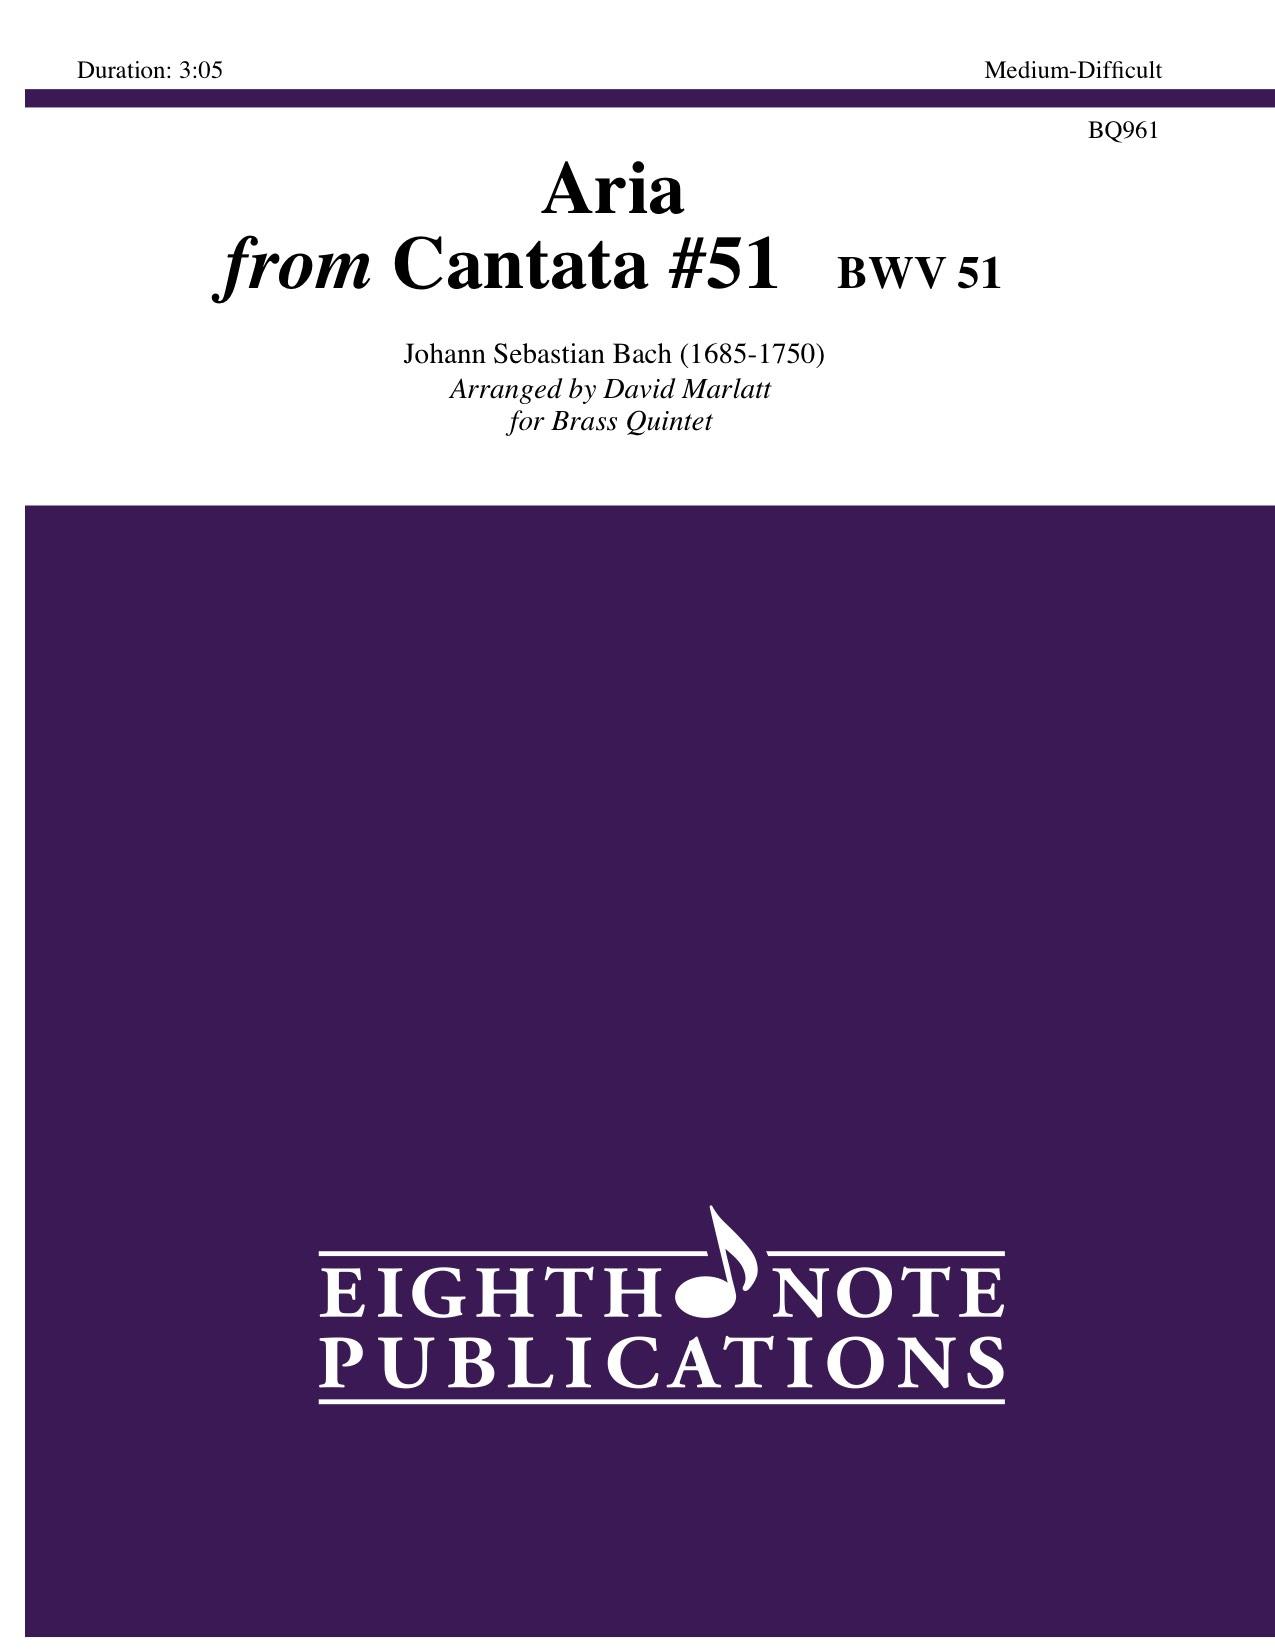 Aria from Cantata 51  BWV 51  - Johann Sebastian Bach